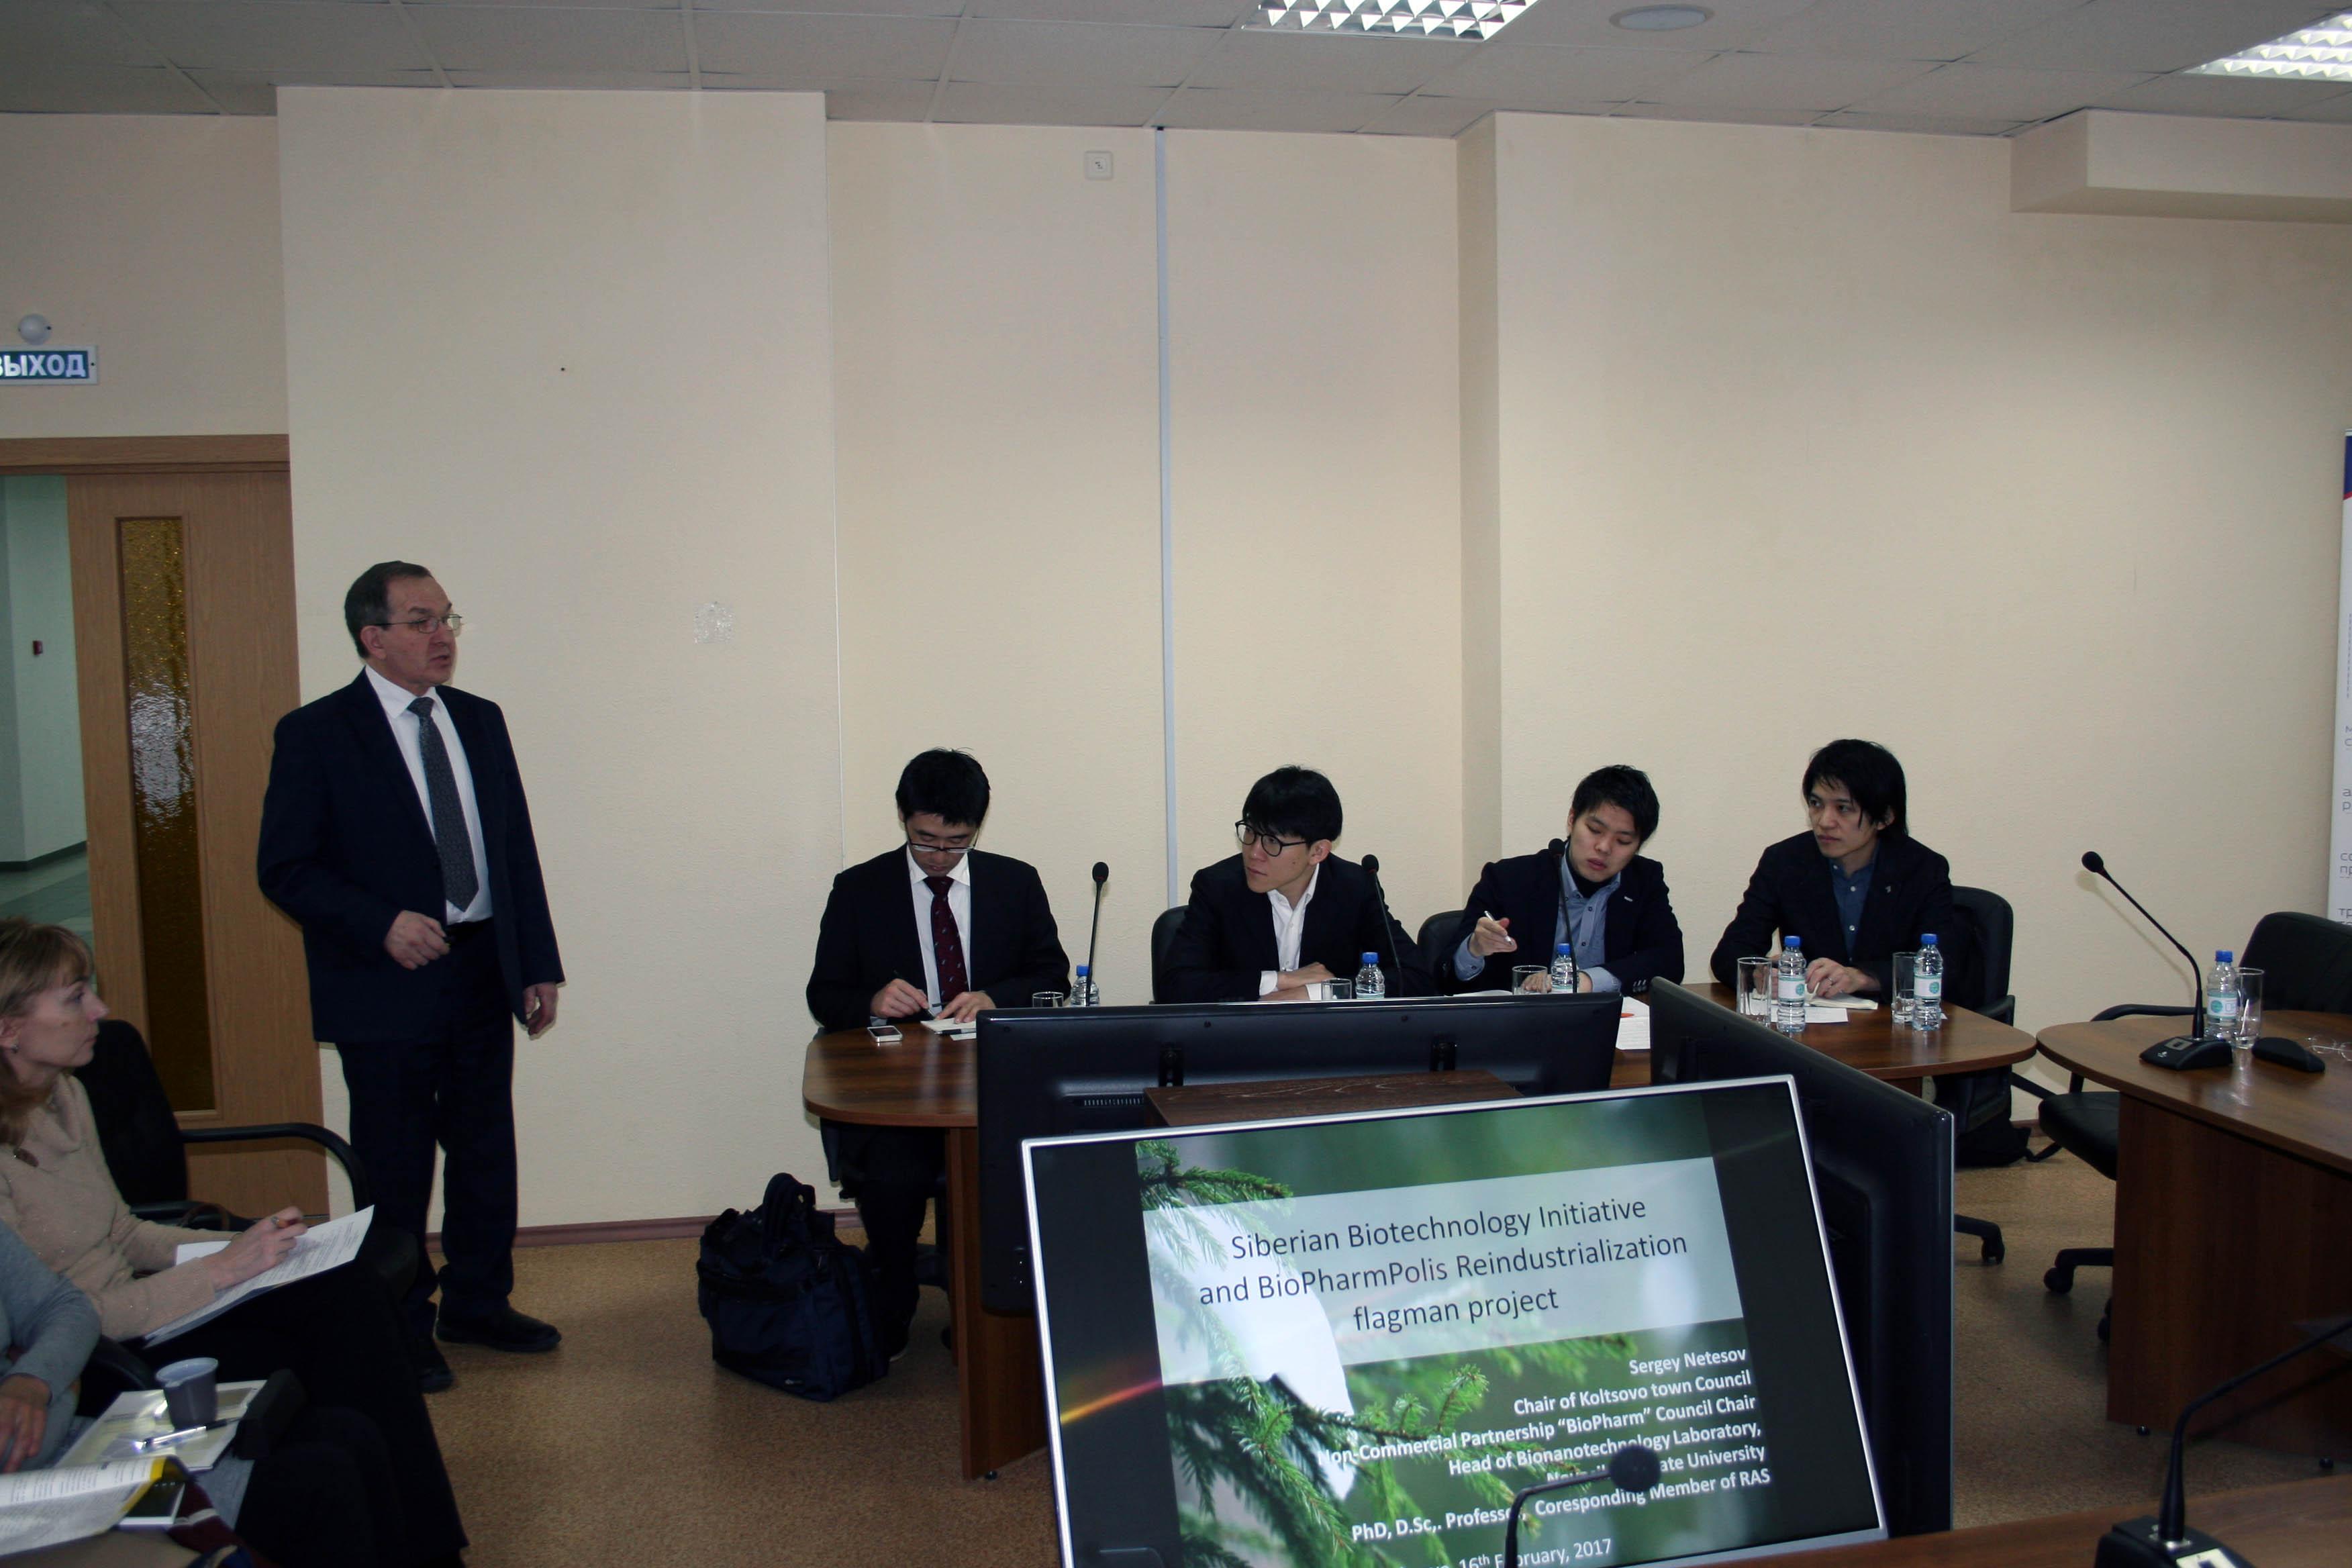 Презентация Сергея Нетёсова